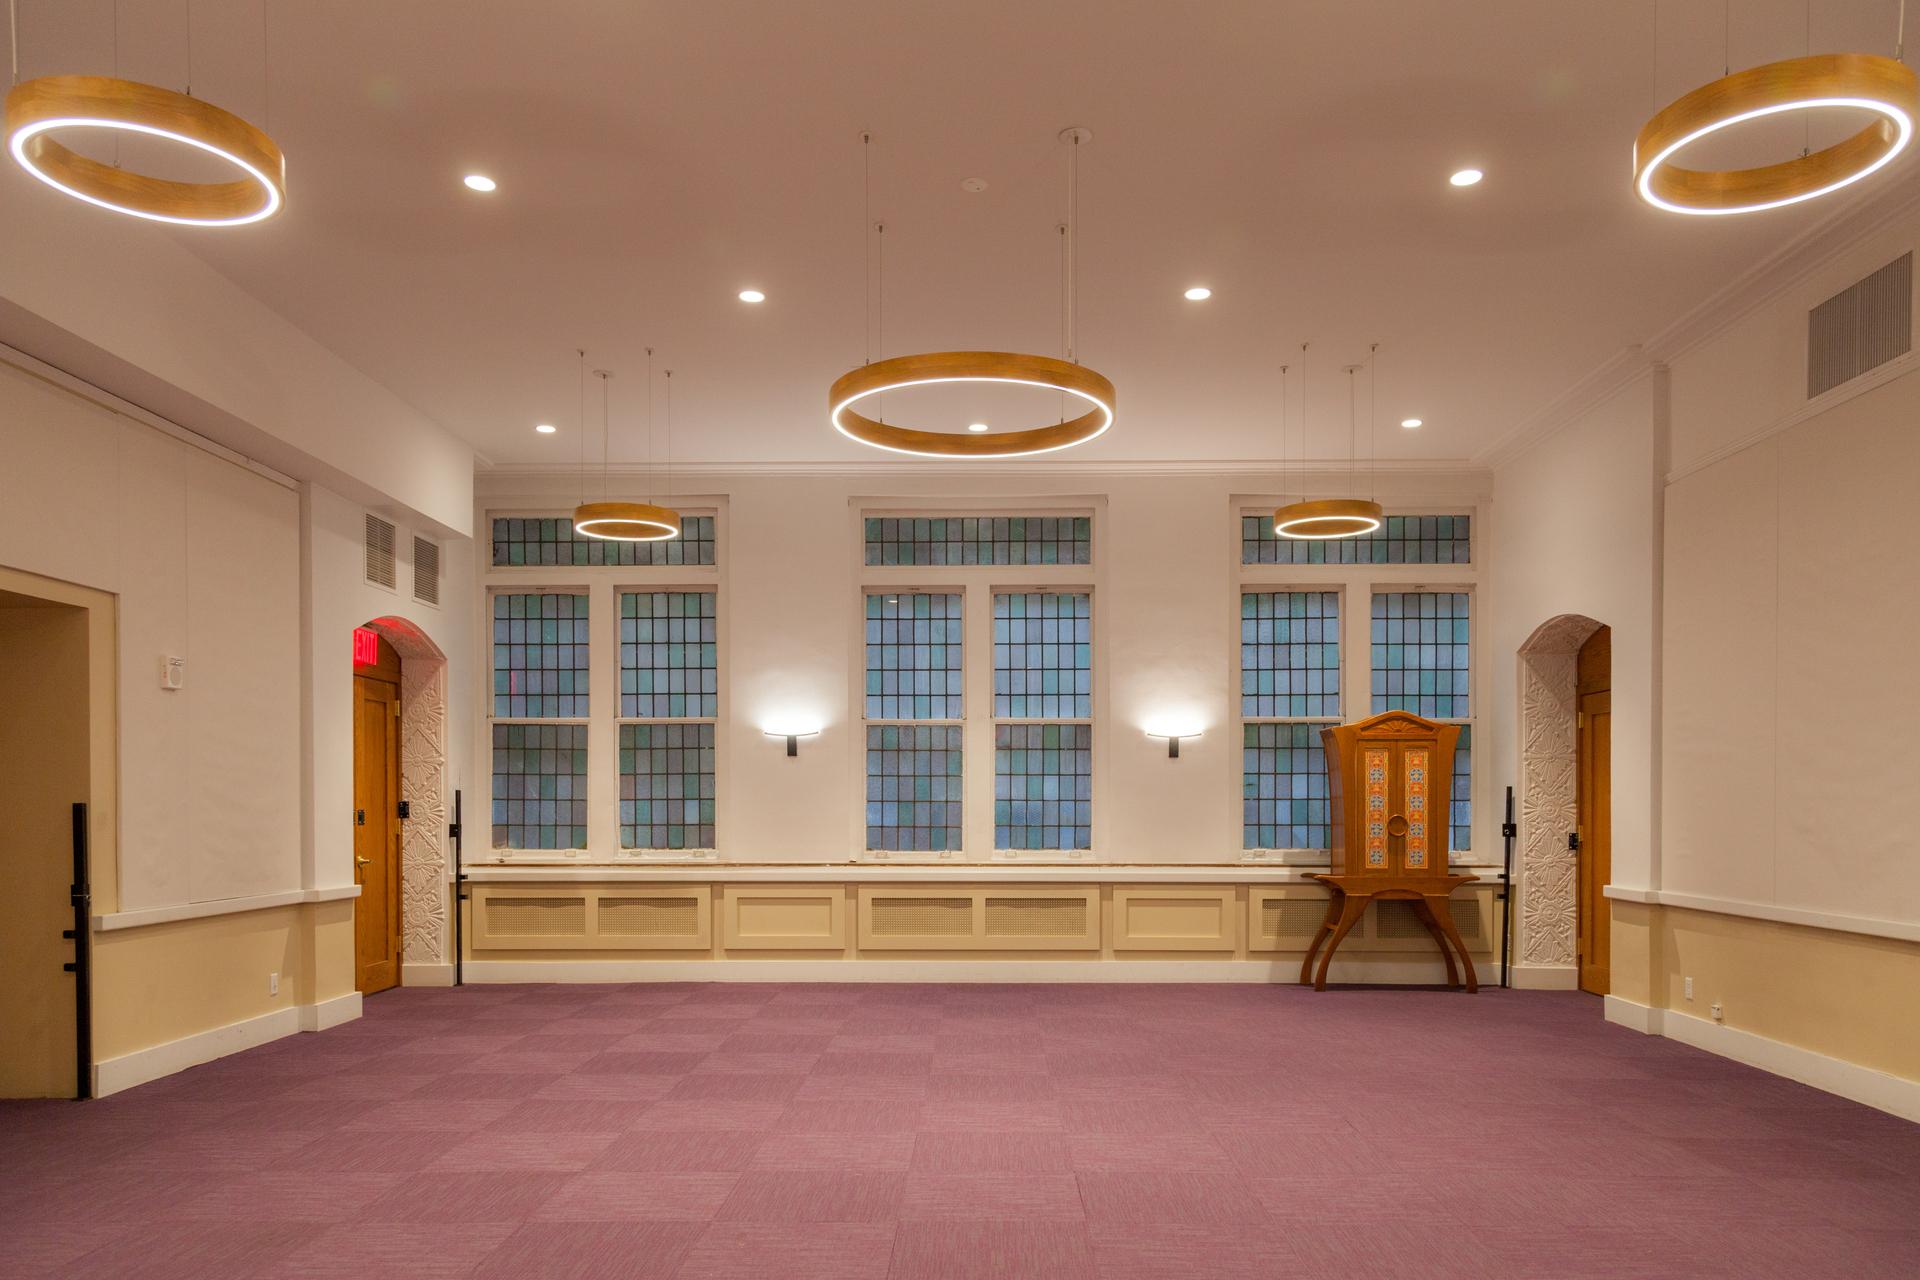 Structura Bnai Jeshurun Synagogue New York Common Area and Versatility Room Pendant Lighting